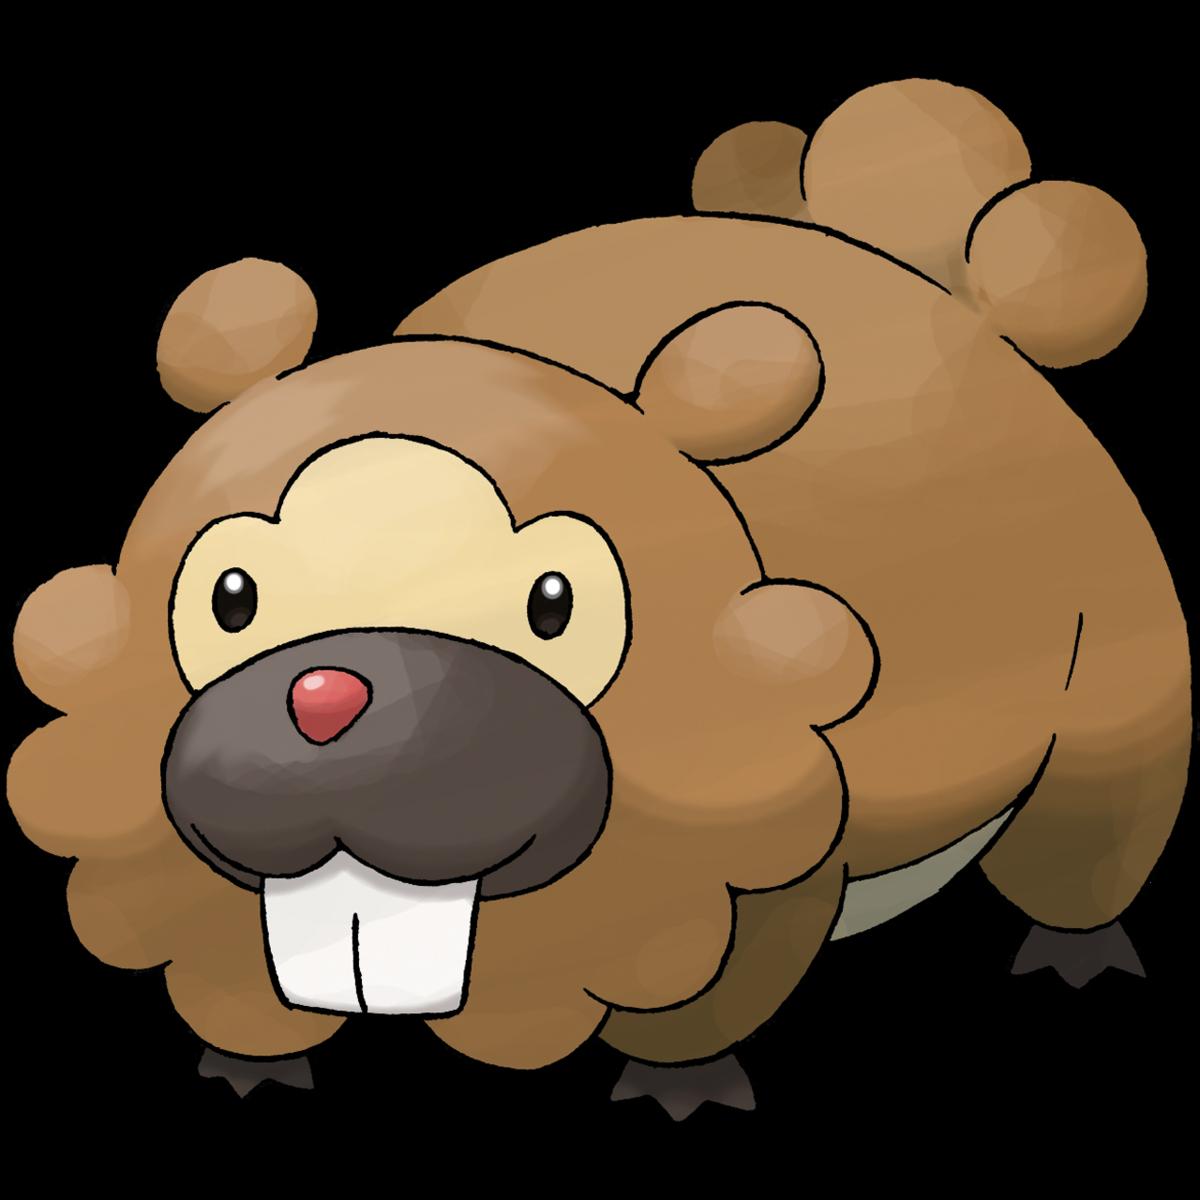 Bidoof (Pokémon).